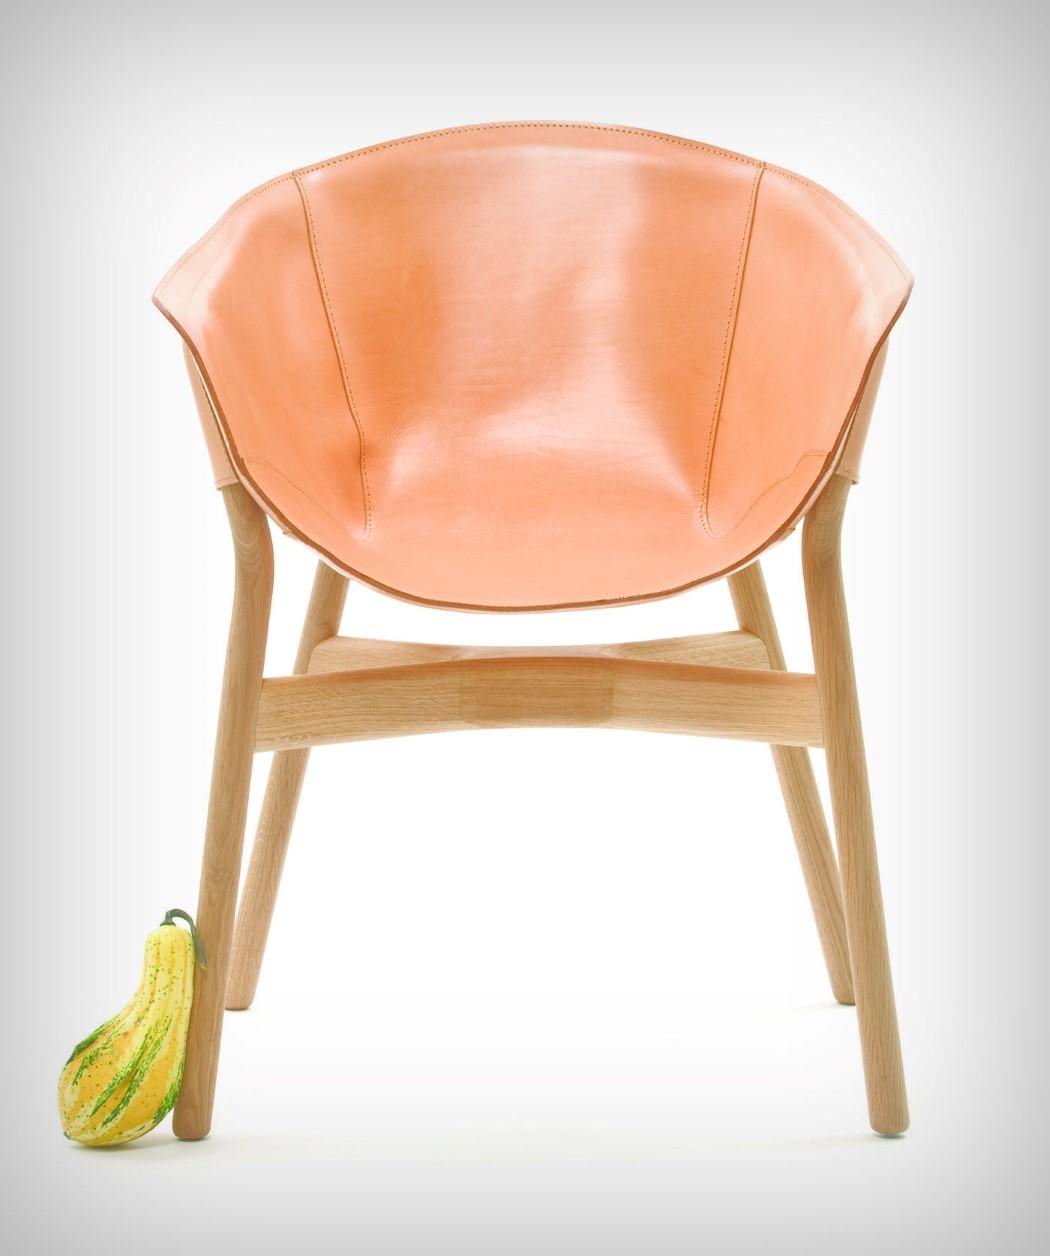 pocket_chair_03